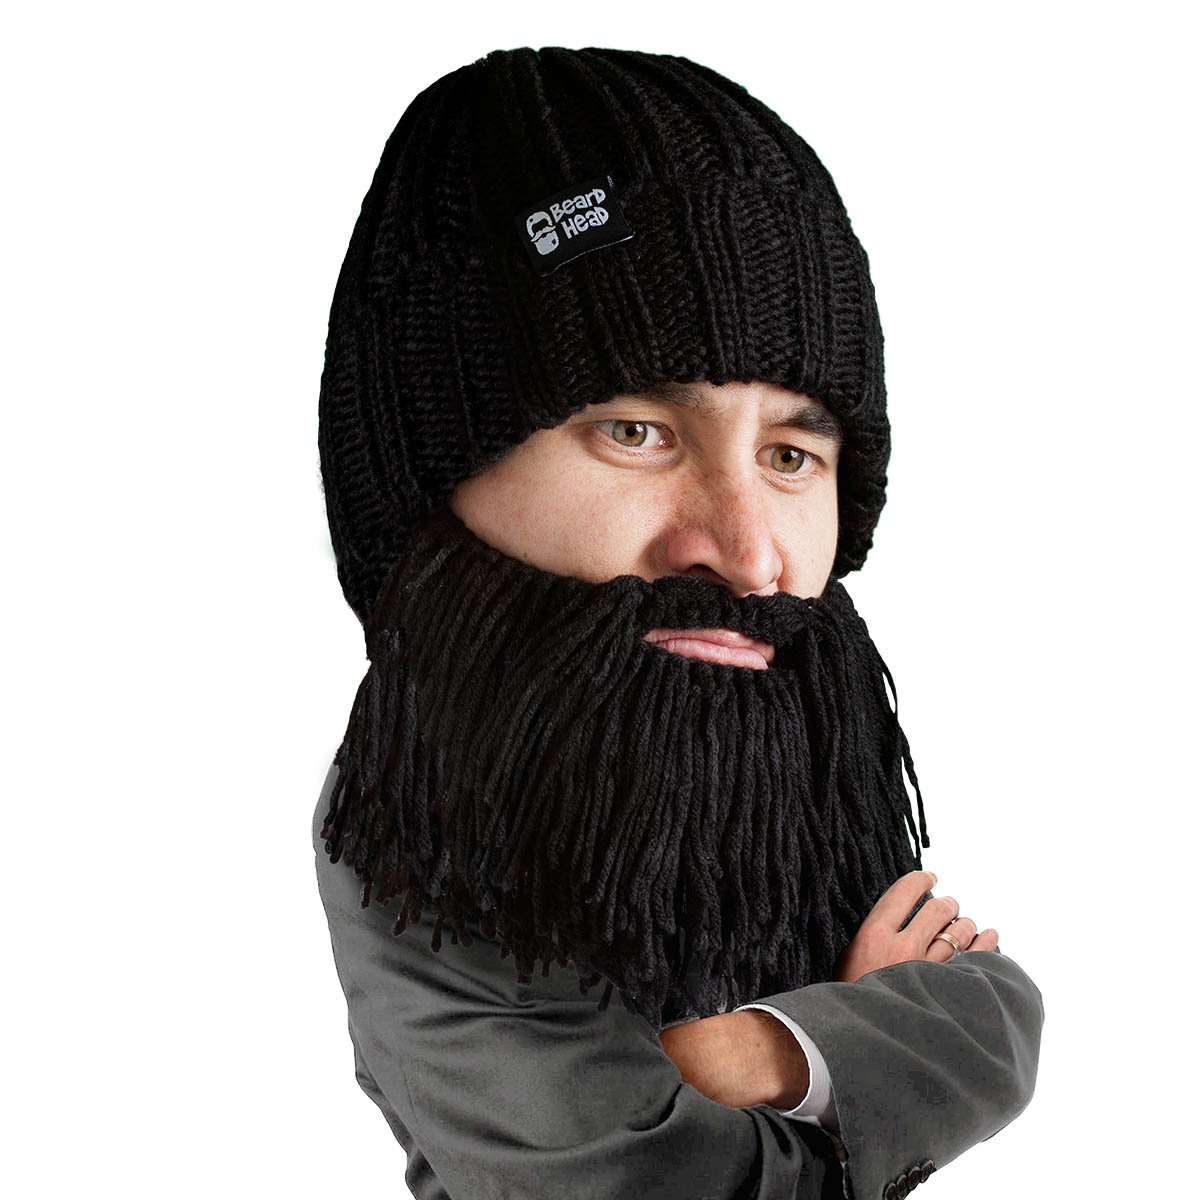 893b4ea93e8 Amazon.com  Beard Head Barbarian Vagabond Beanie - Funny Knit Hat and Fake Beard  Facemask Black  Clothing